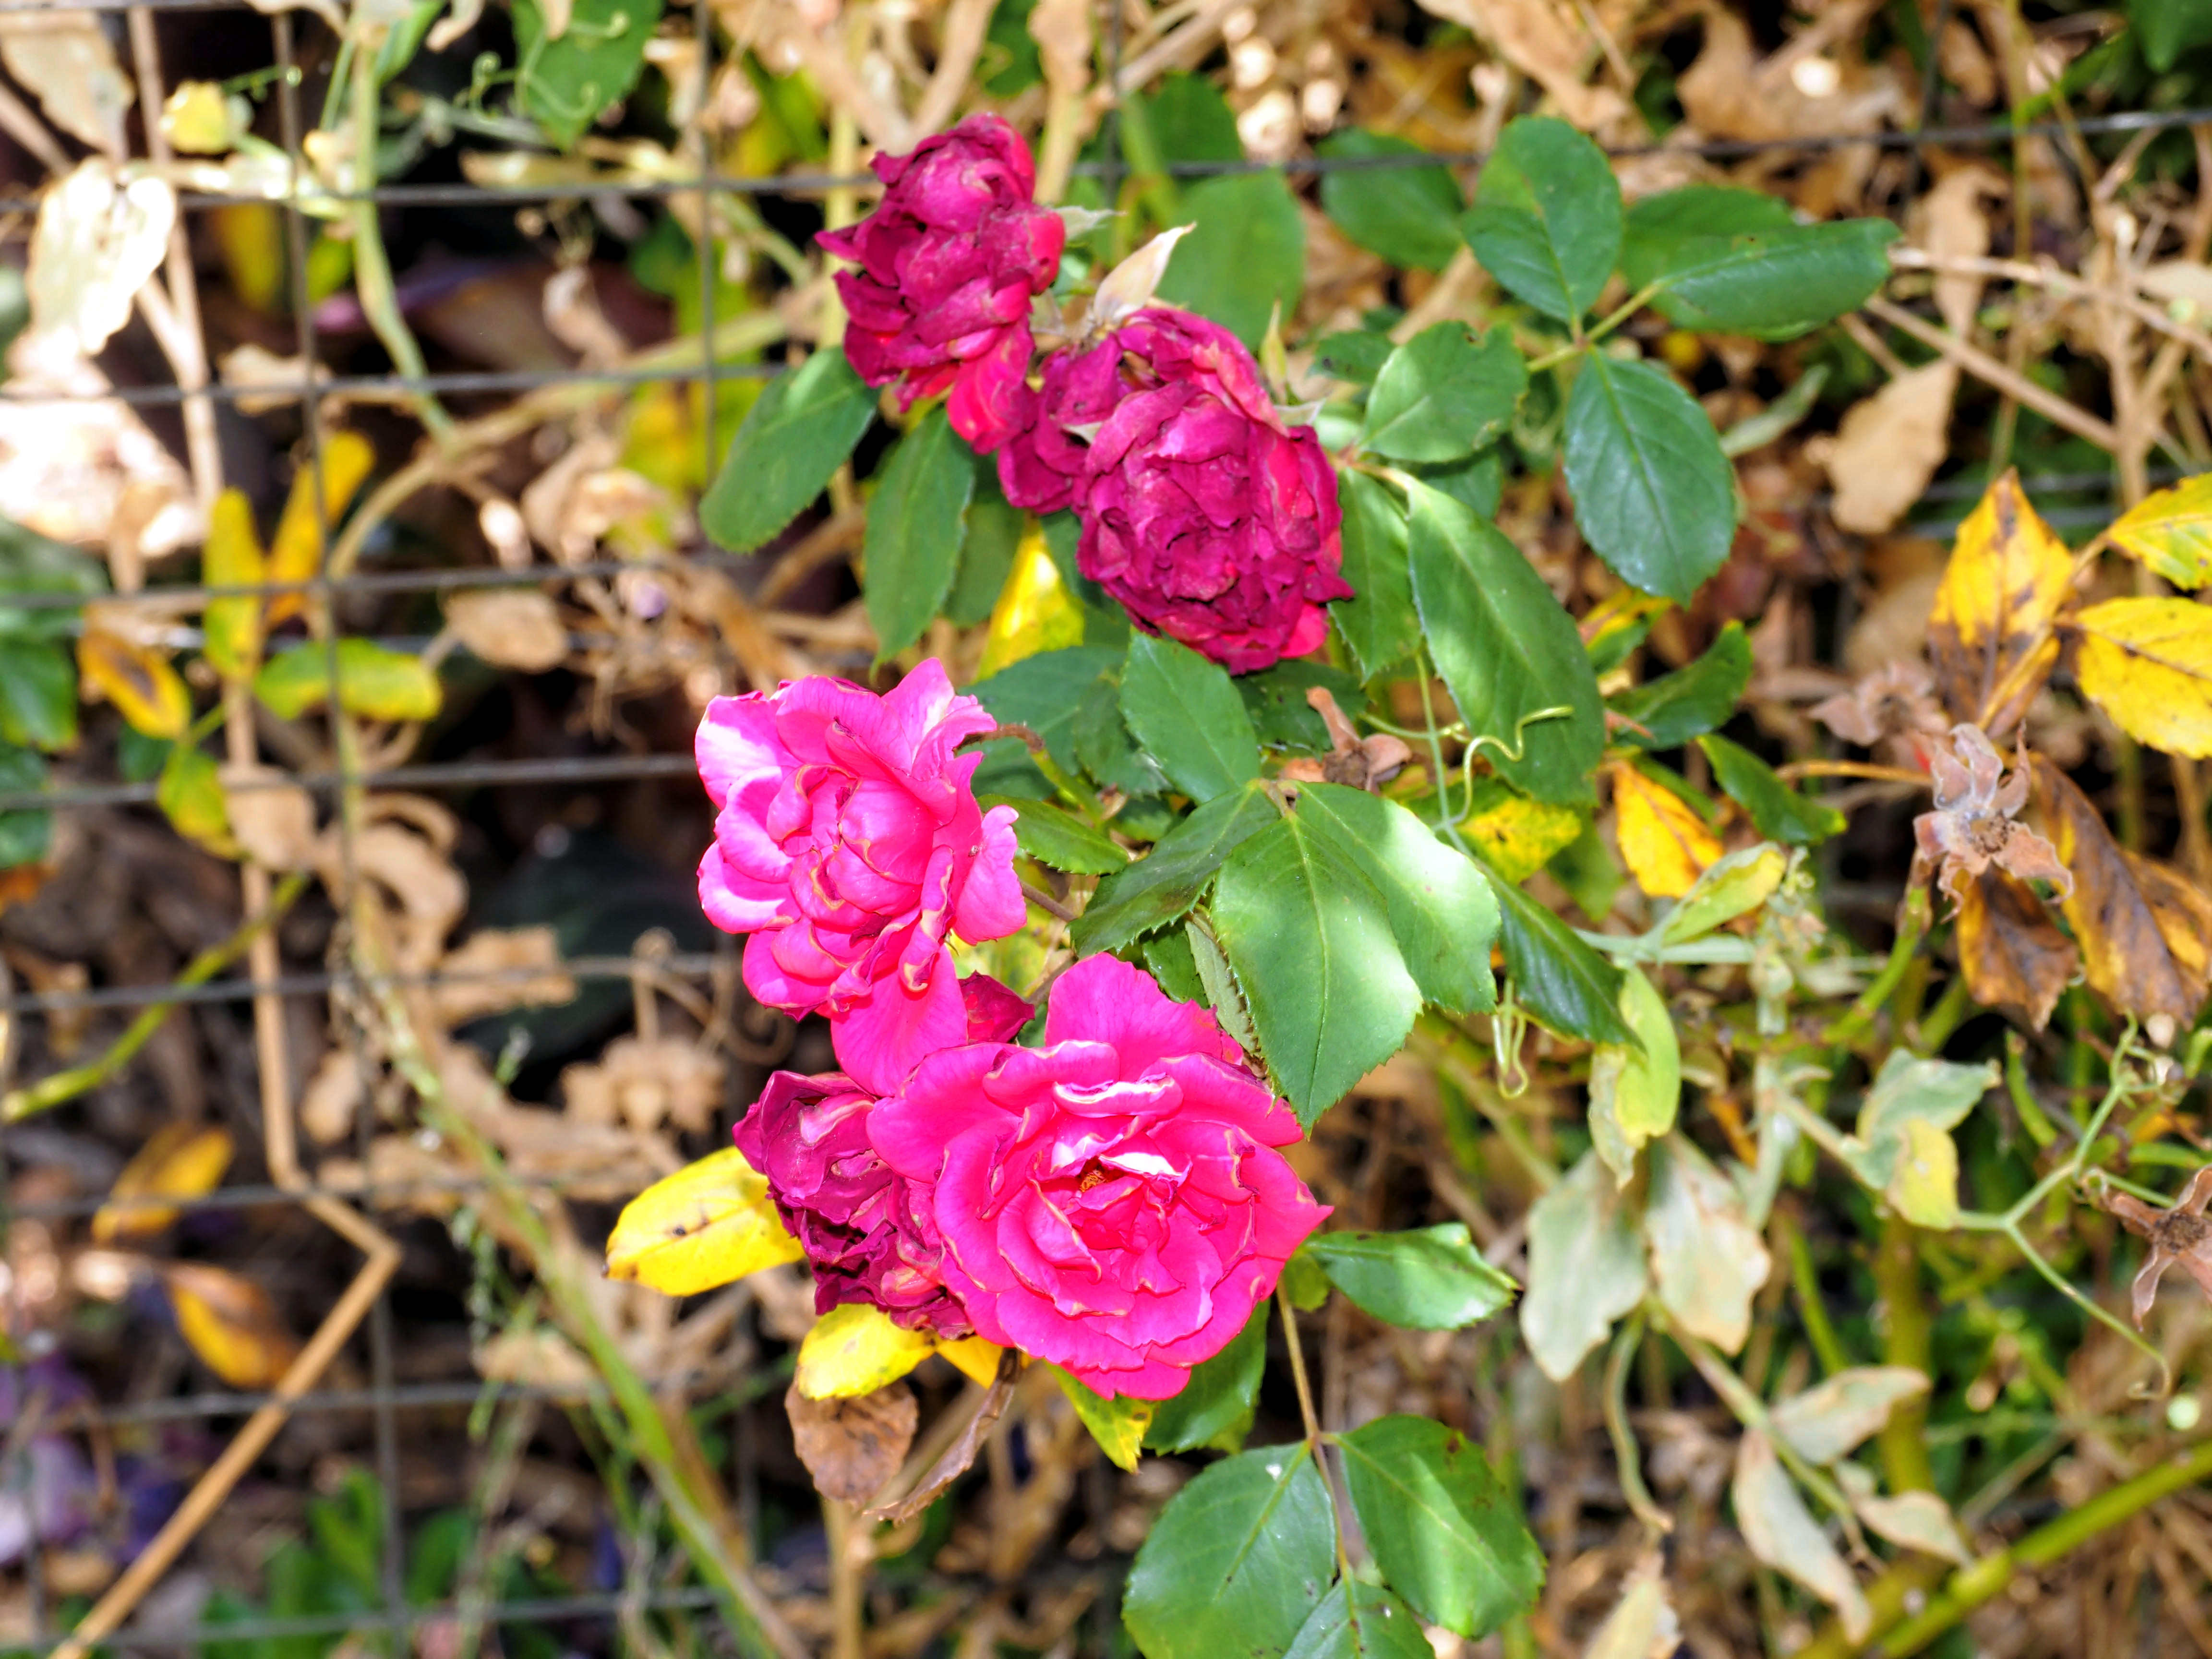 Rosa-2.jpeg